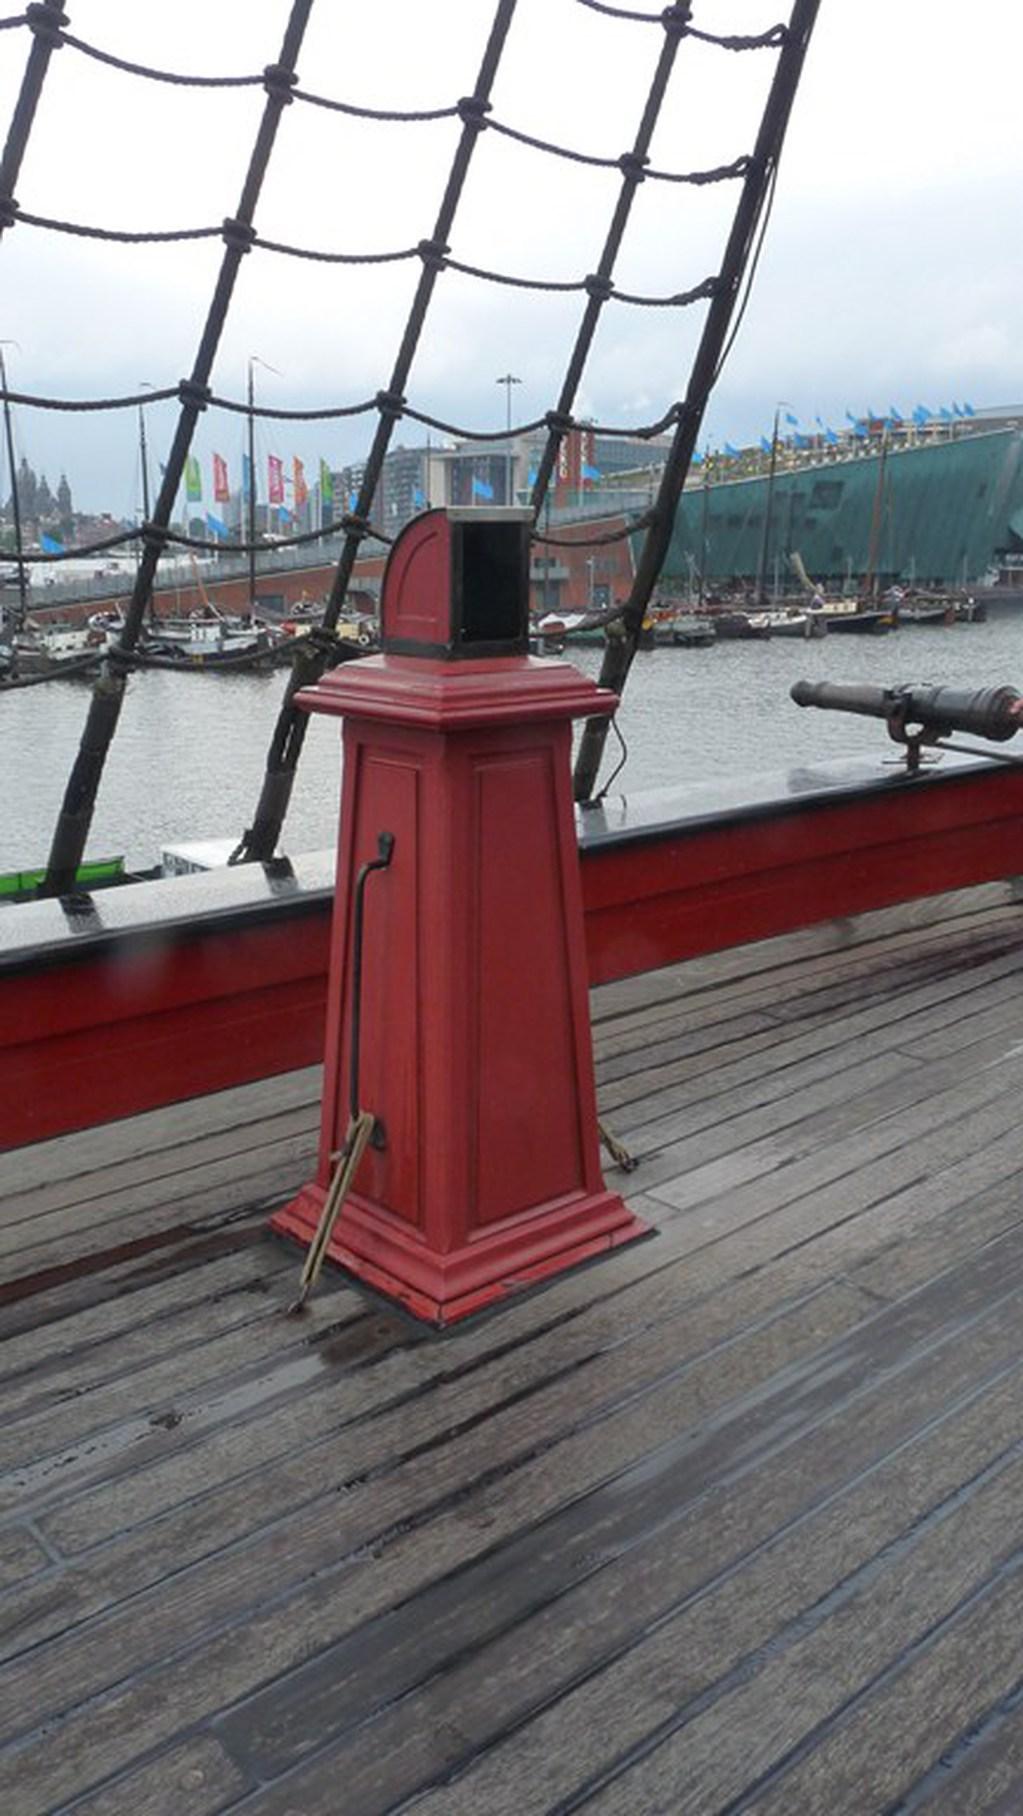 Visite du VOC « AMSTERDAM » (1749) à Amsterdam 17072807405823134915176628